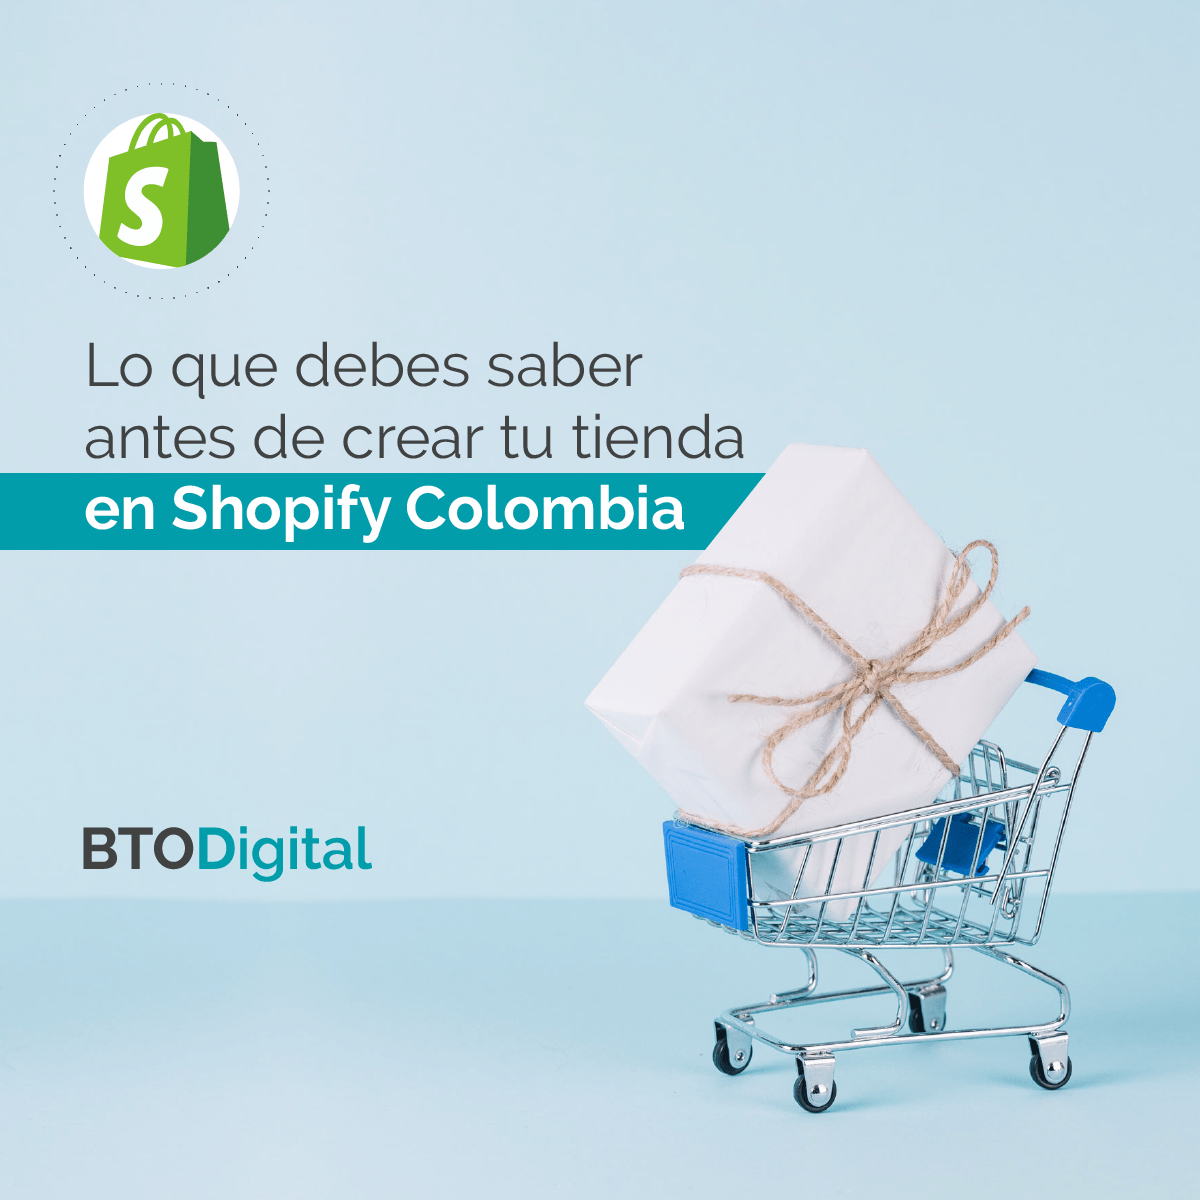 Shopify Colombia - Agencia de Marketing Digital - BTODigital